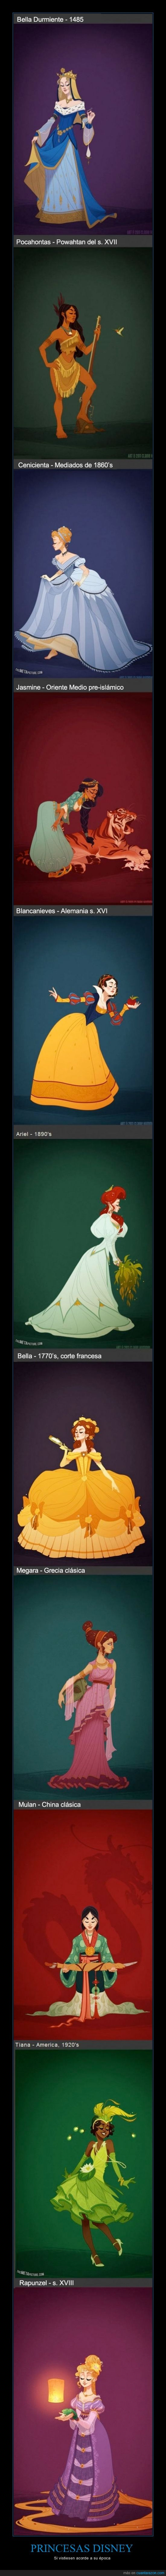 ariel,Aurora,Bella,blancanieves,Cenicienta,jasmin,Megara,mulan,pocahontas,princesas disney,rapunzel,tiana